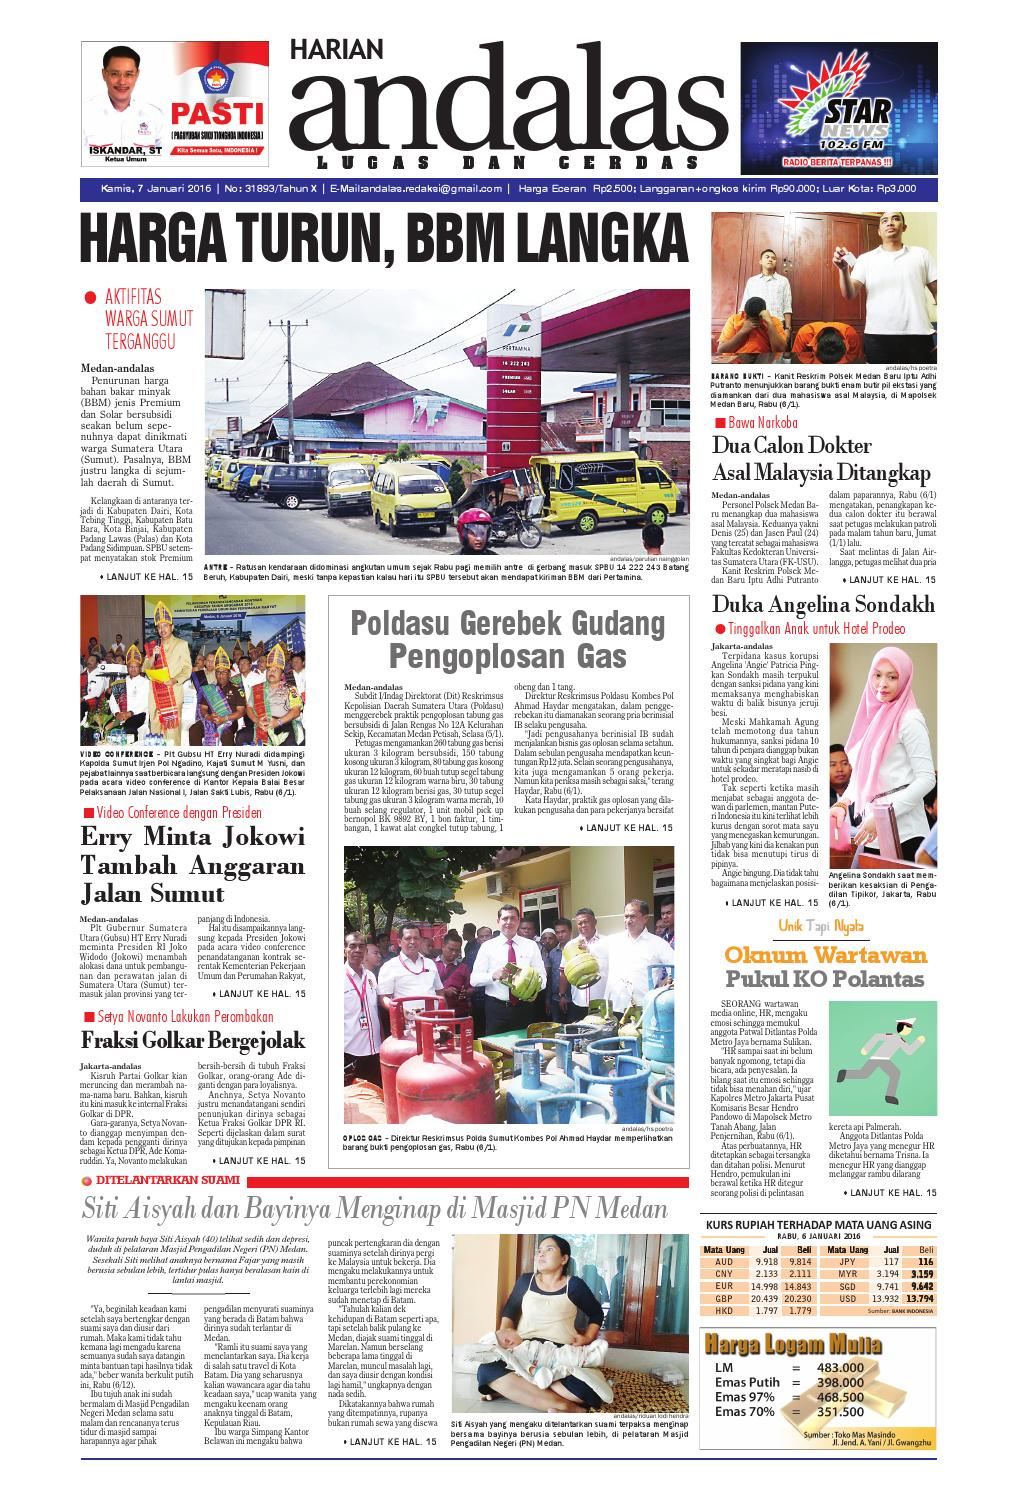 Epaper andalas edisi kamis 7 januari 2016 by media andalas - issuu 130f49d6d5